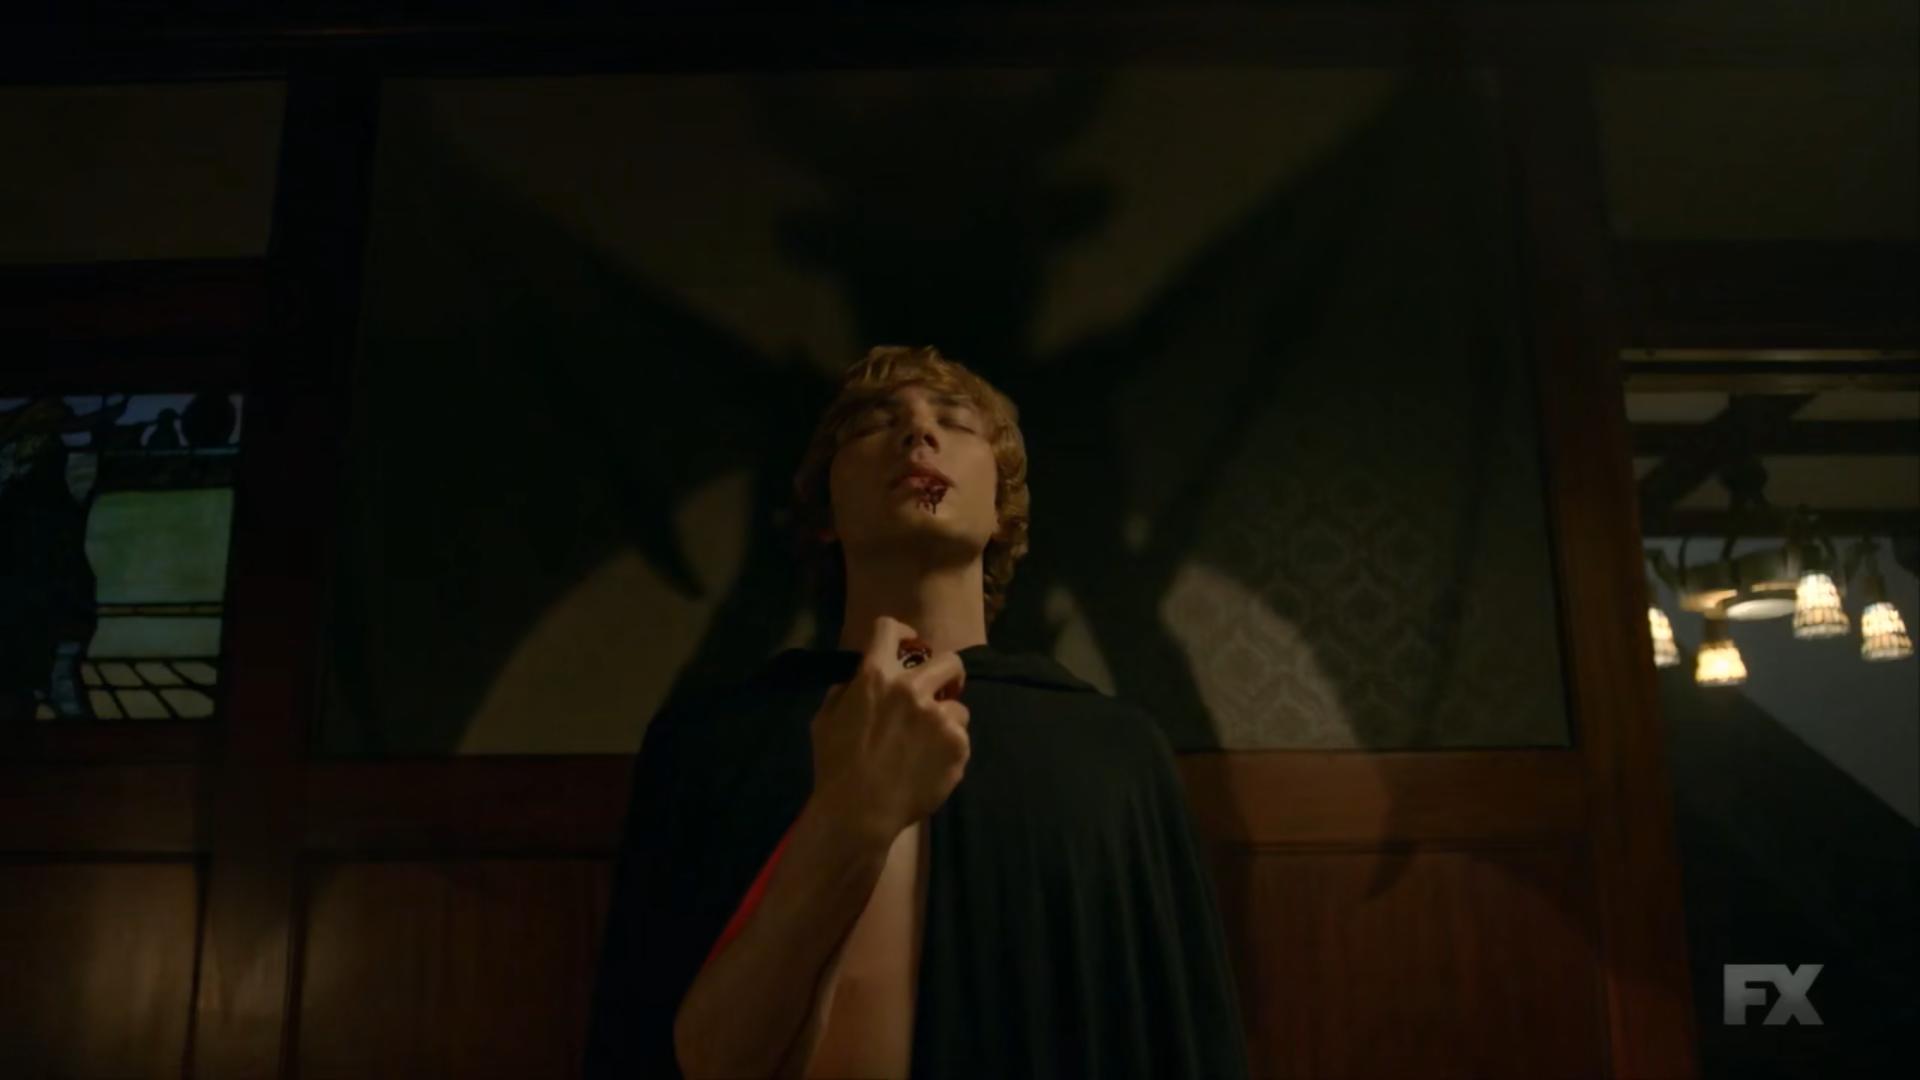 The Devil (American Horror Story)